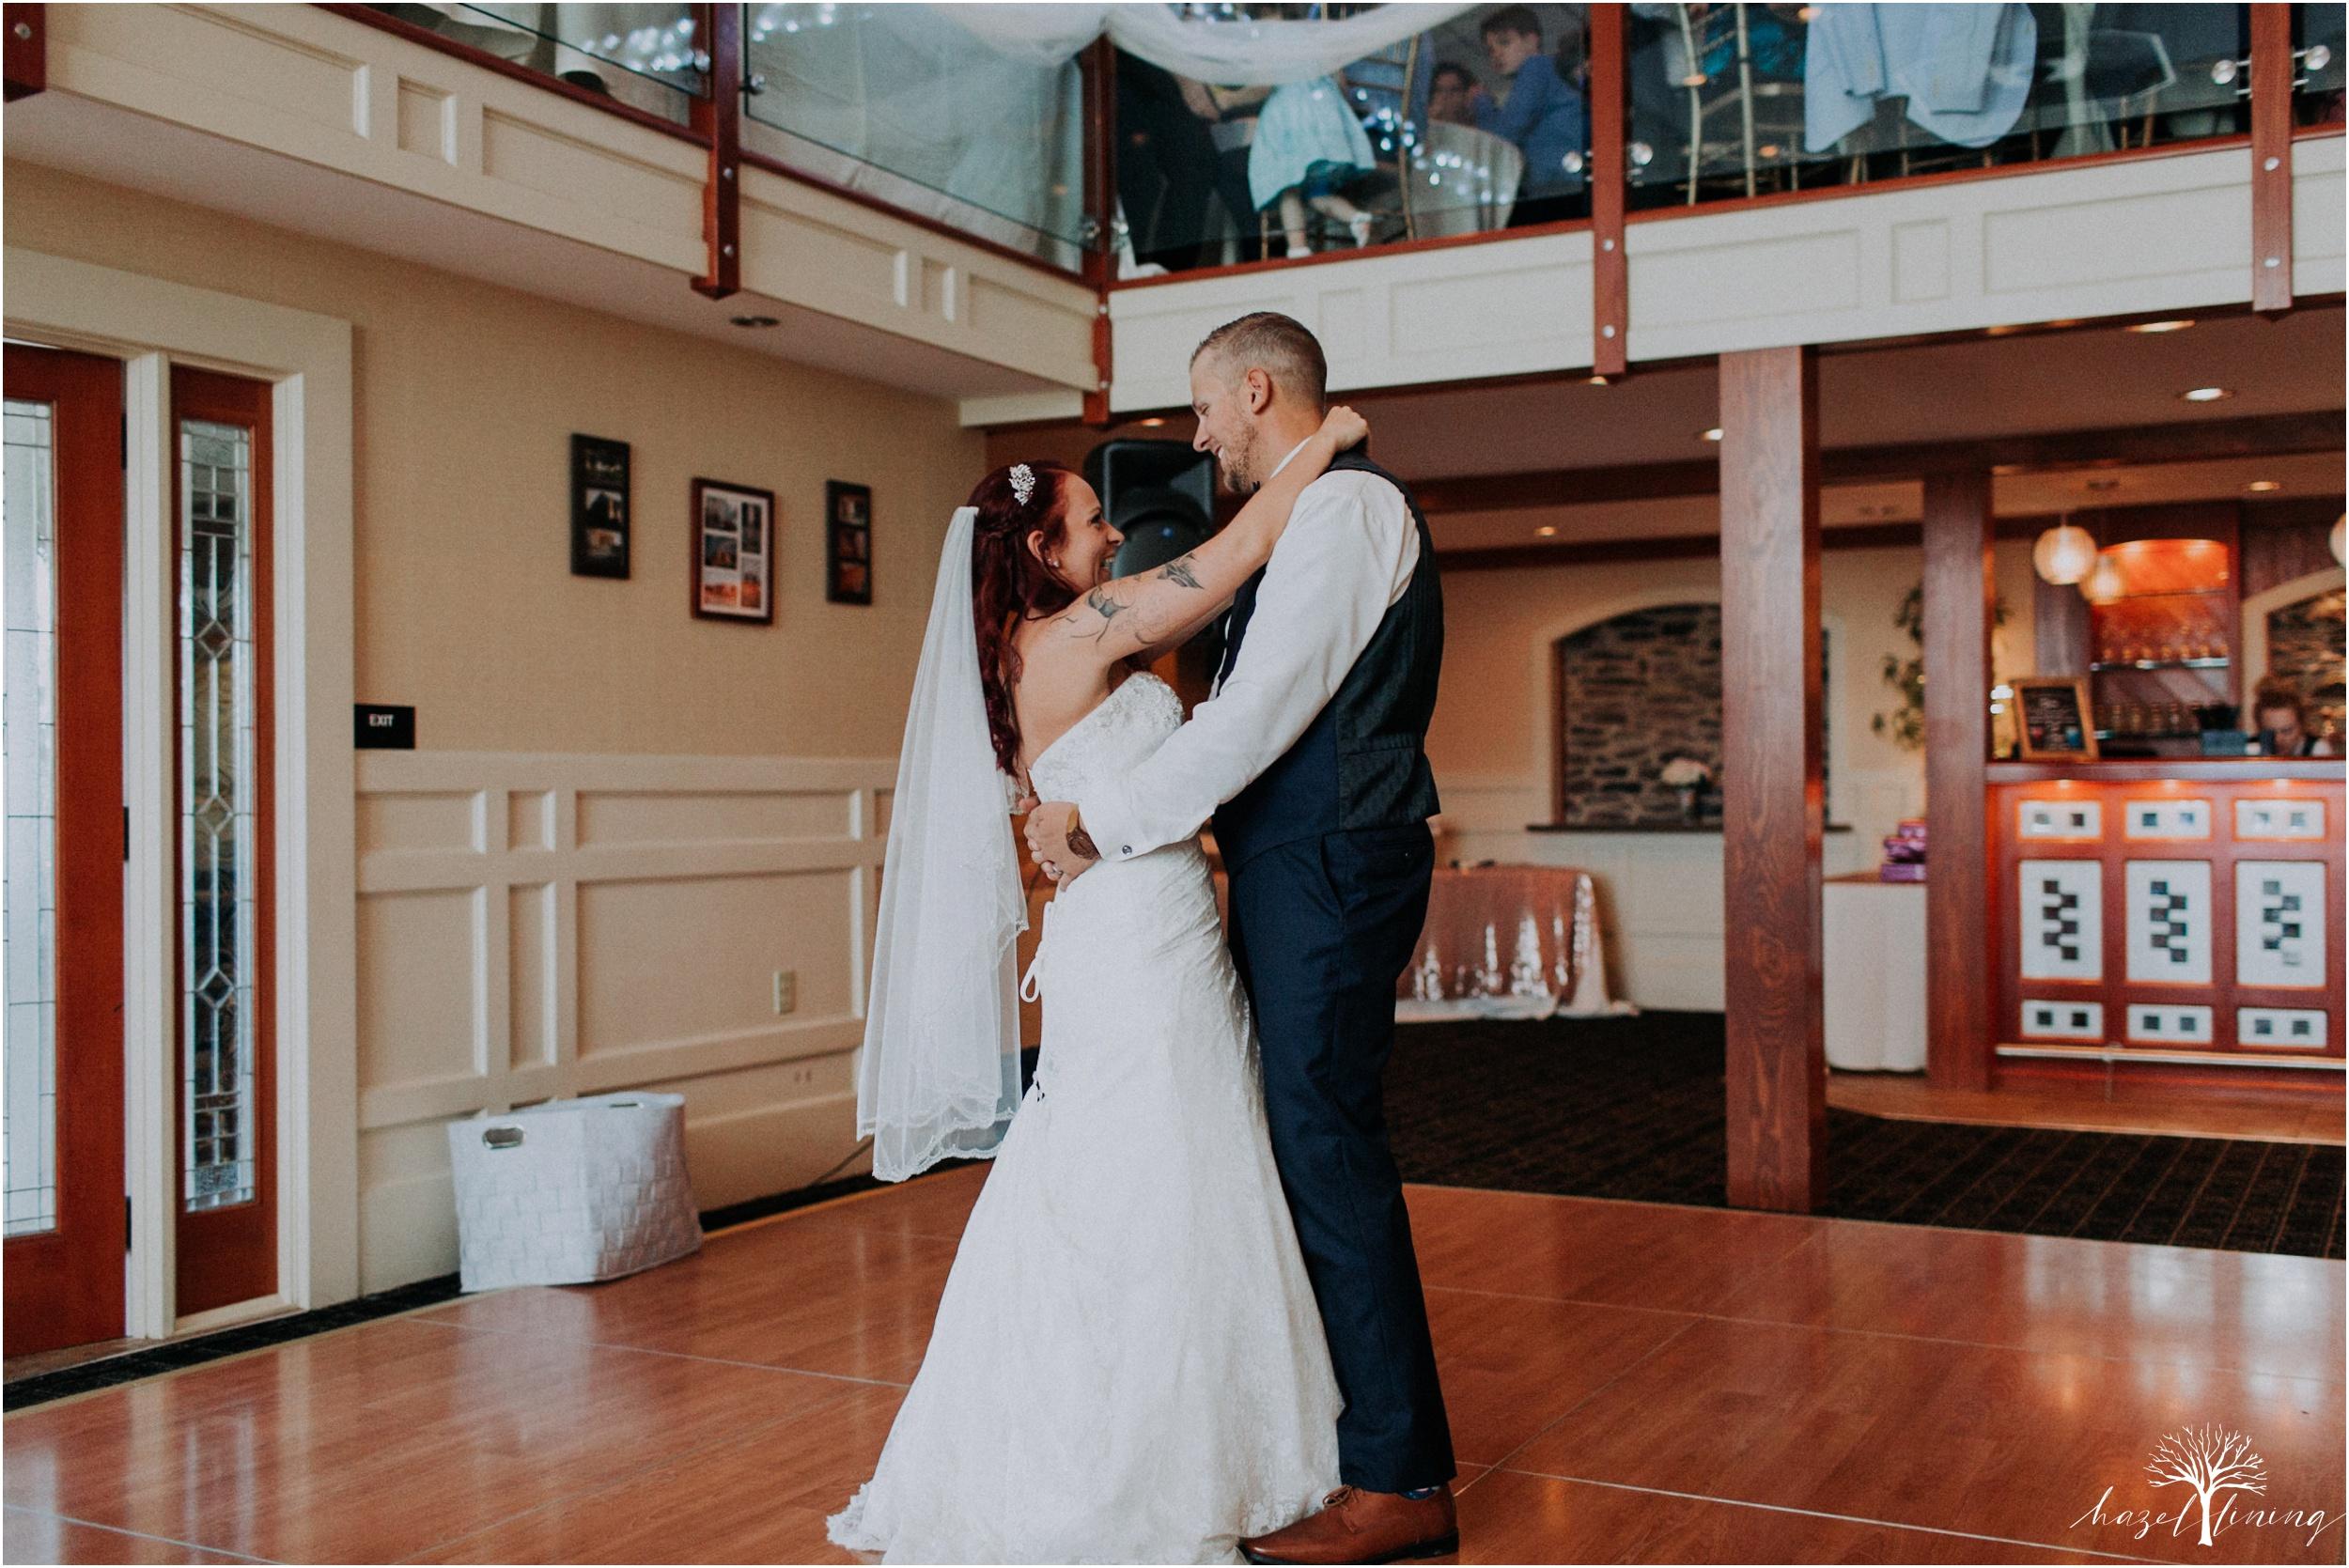 alyssa-james-stiteler-wedding-loft-and-sweet-water-cc-pennsburg-pennsylvania-hazel-lining-travel-wedding-elopement-photography_0128.jpg